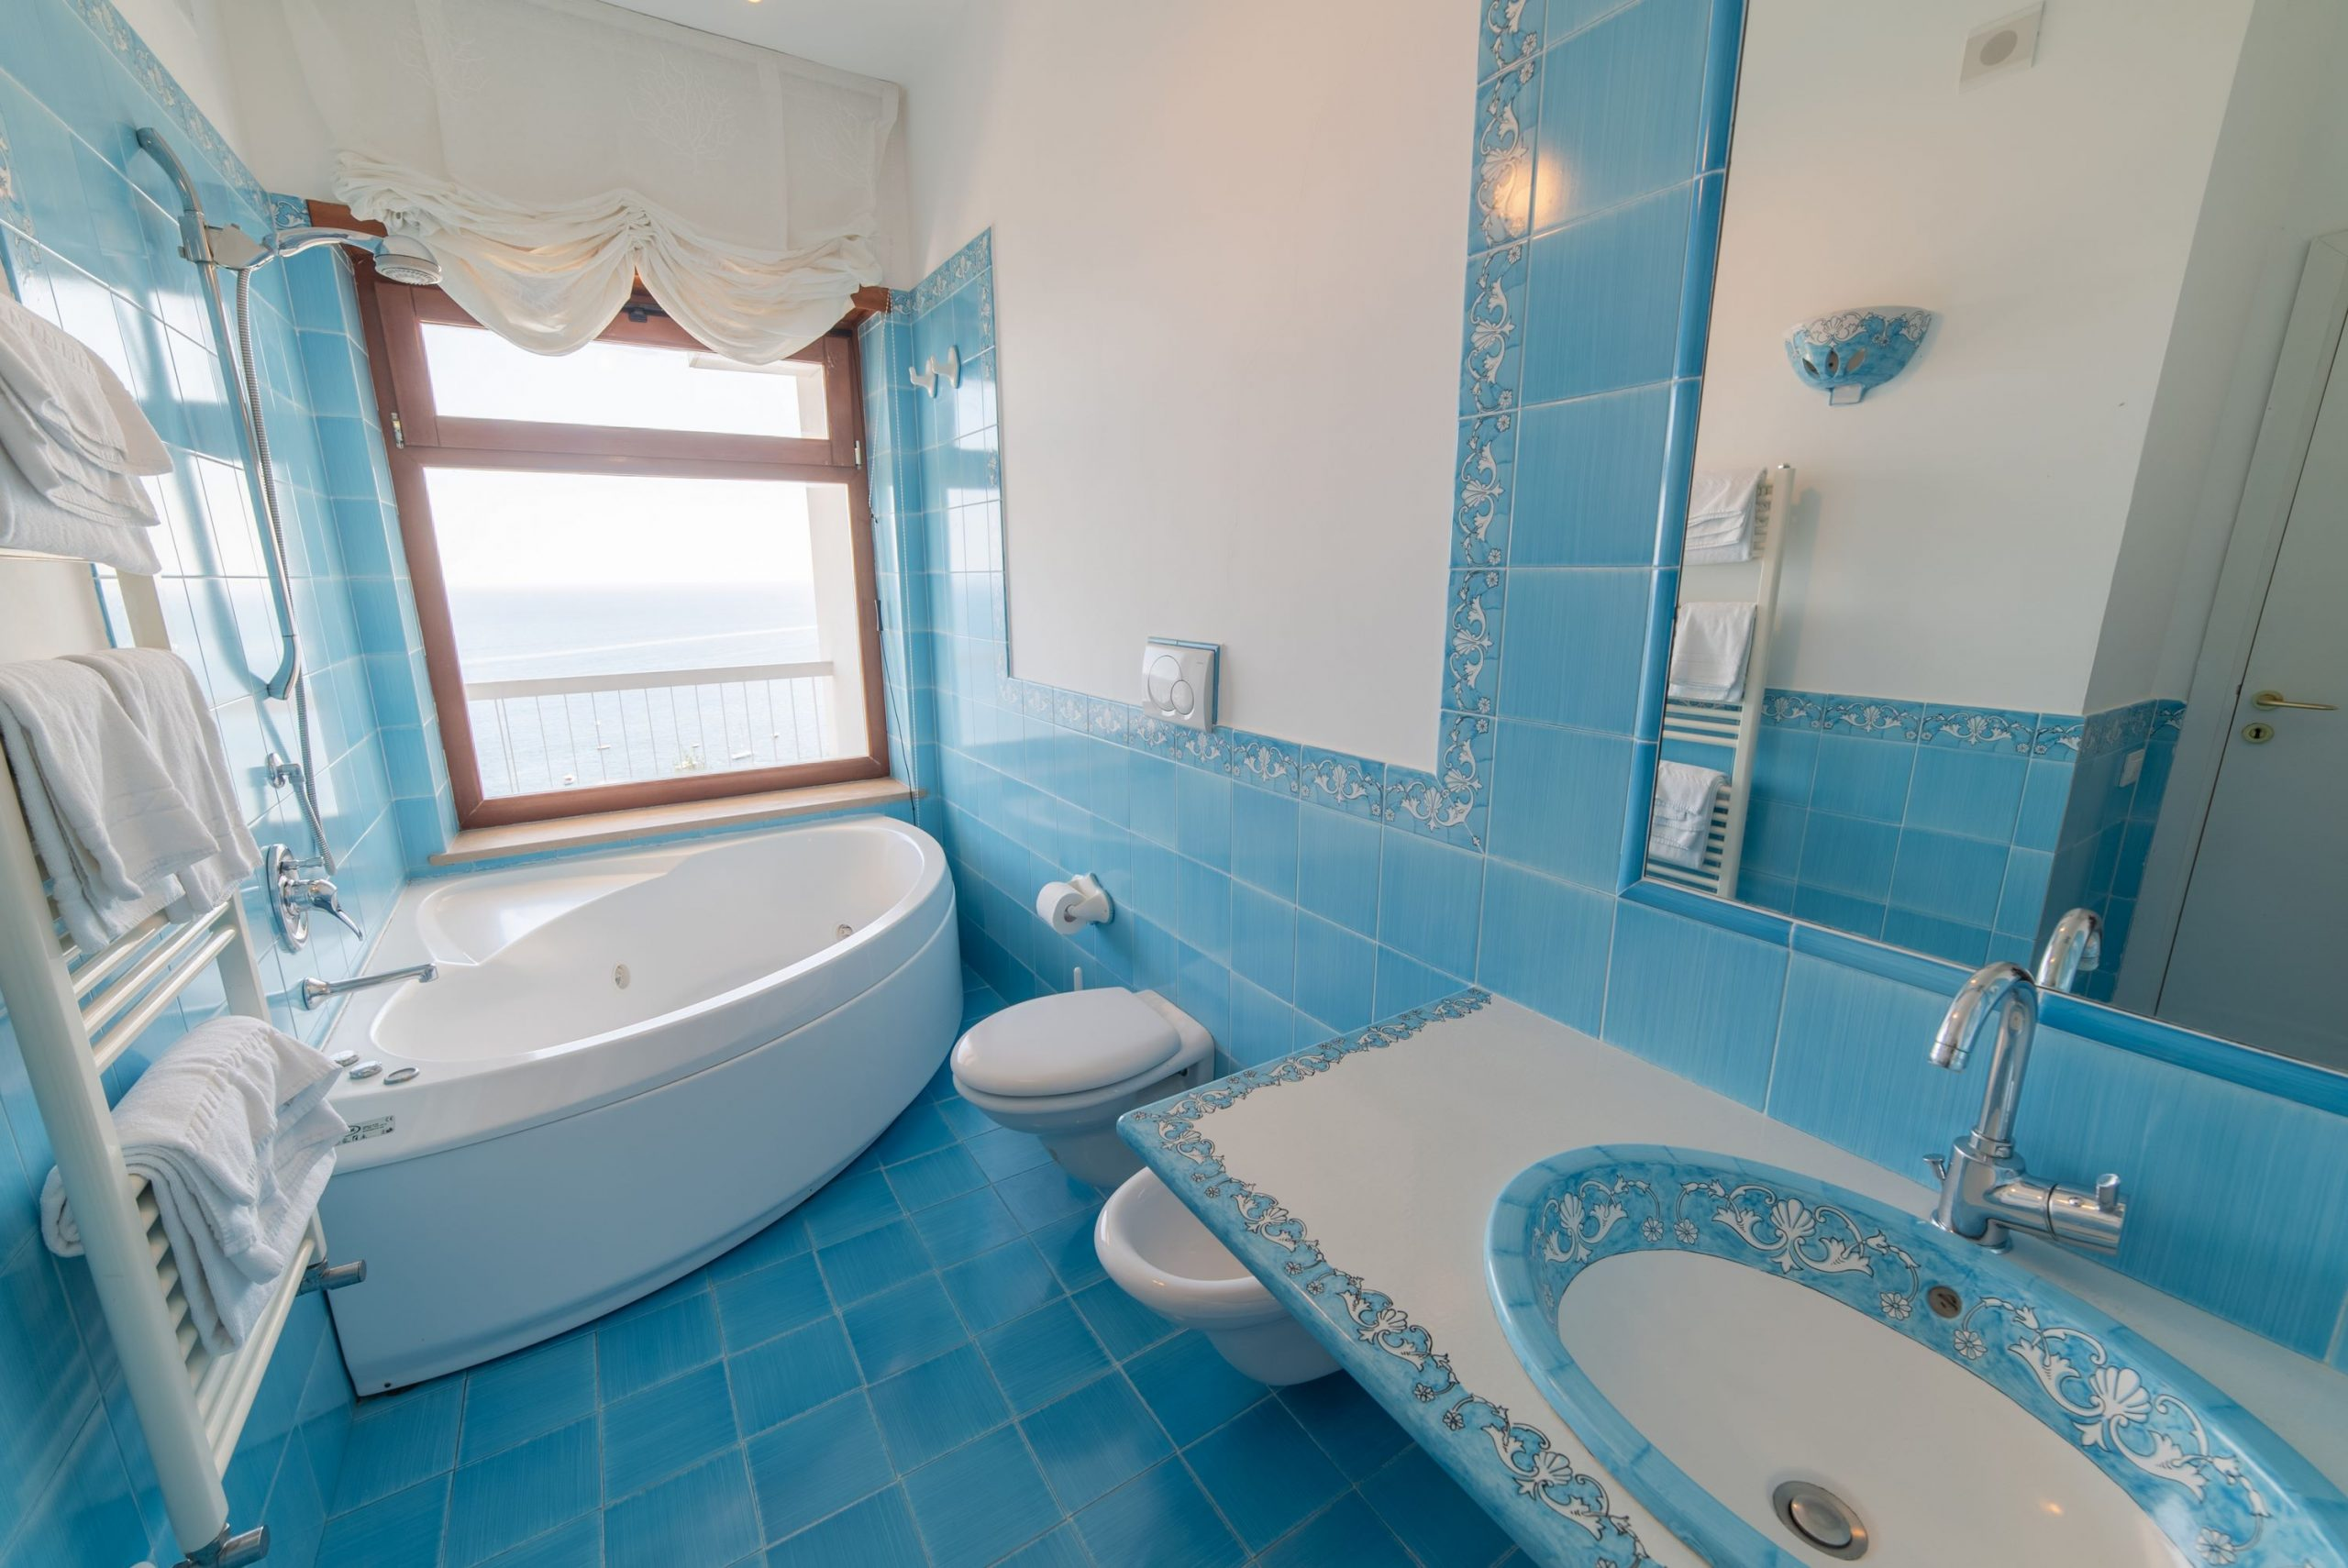 Villa Sorrento Coast with swimming pool bathroom